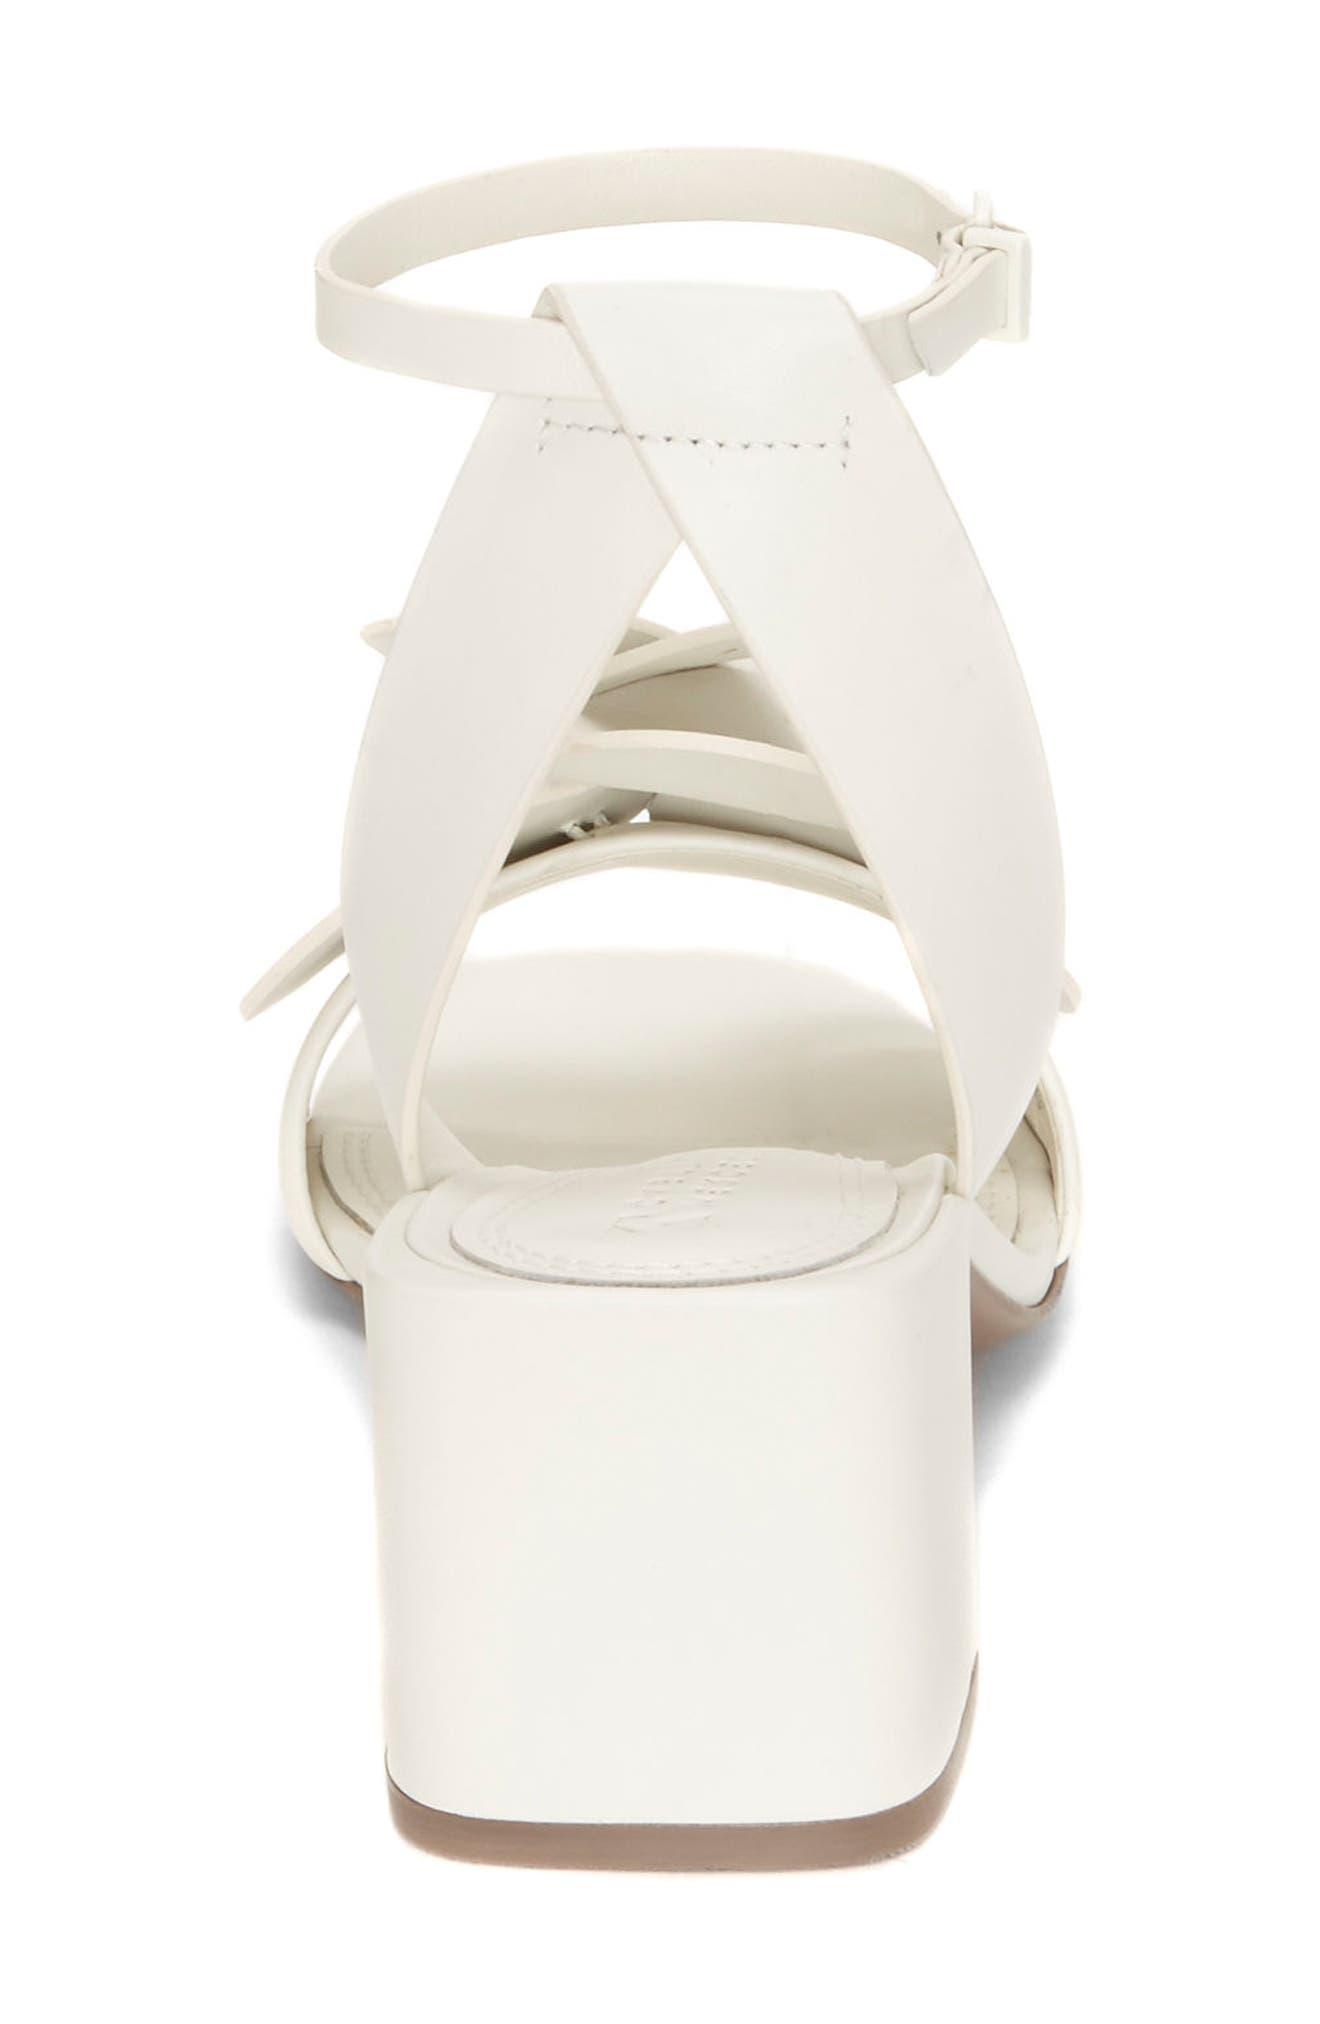 Tealia Sculpted Floral Sandal,                             Alternate thumbnail 5, color,                             White Leather